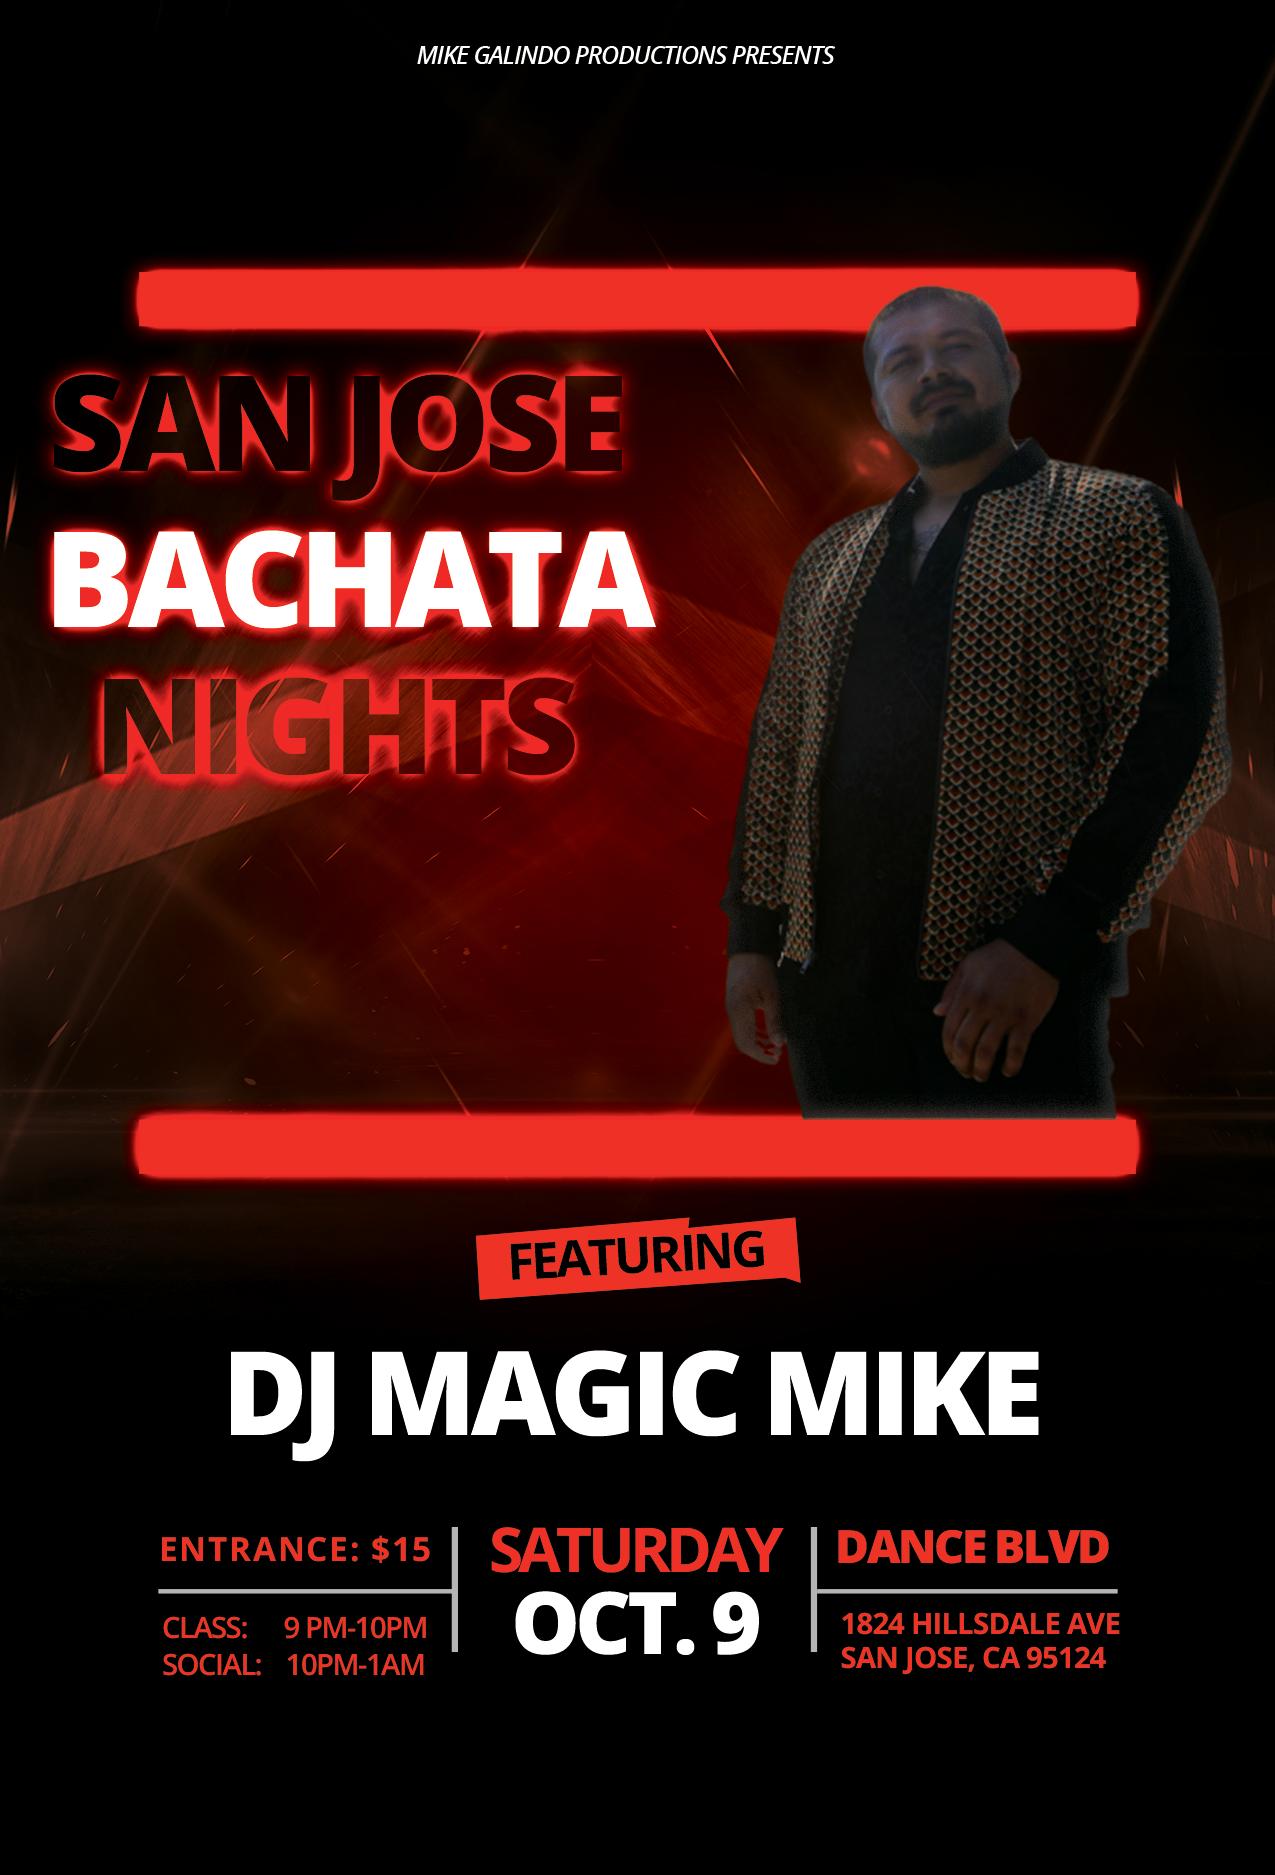 San Jose Bachata Nights - DJ Magic Mike